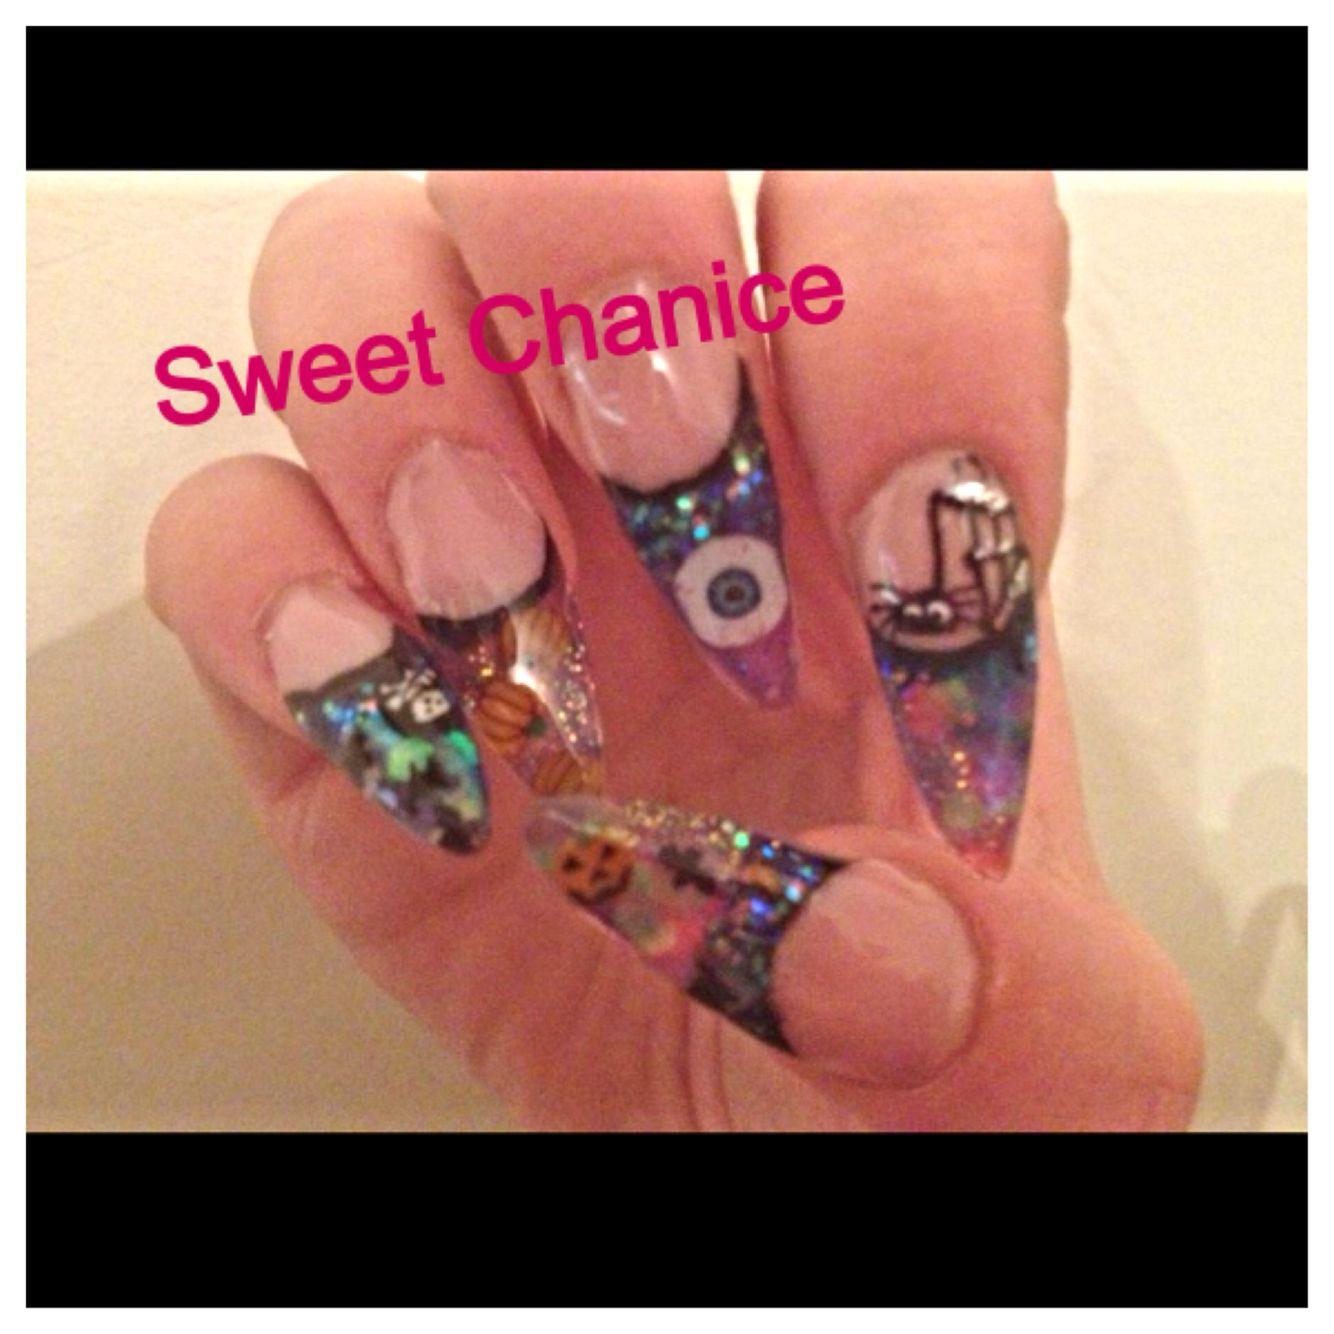 Halloween nails 👻 | Halloween nails, Nail art stripes ...